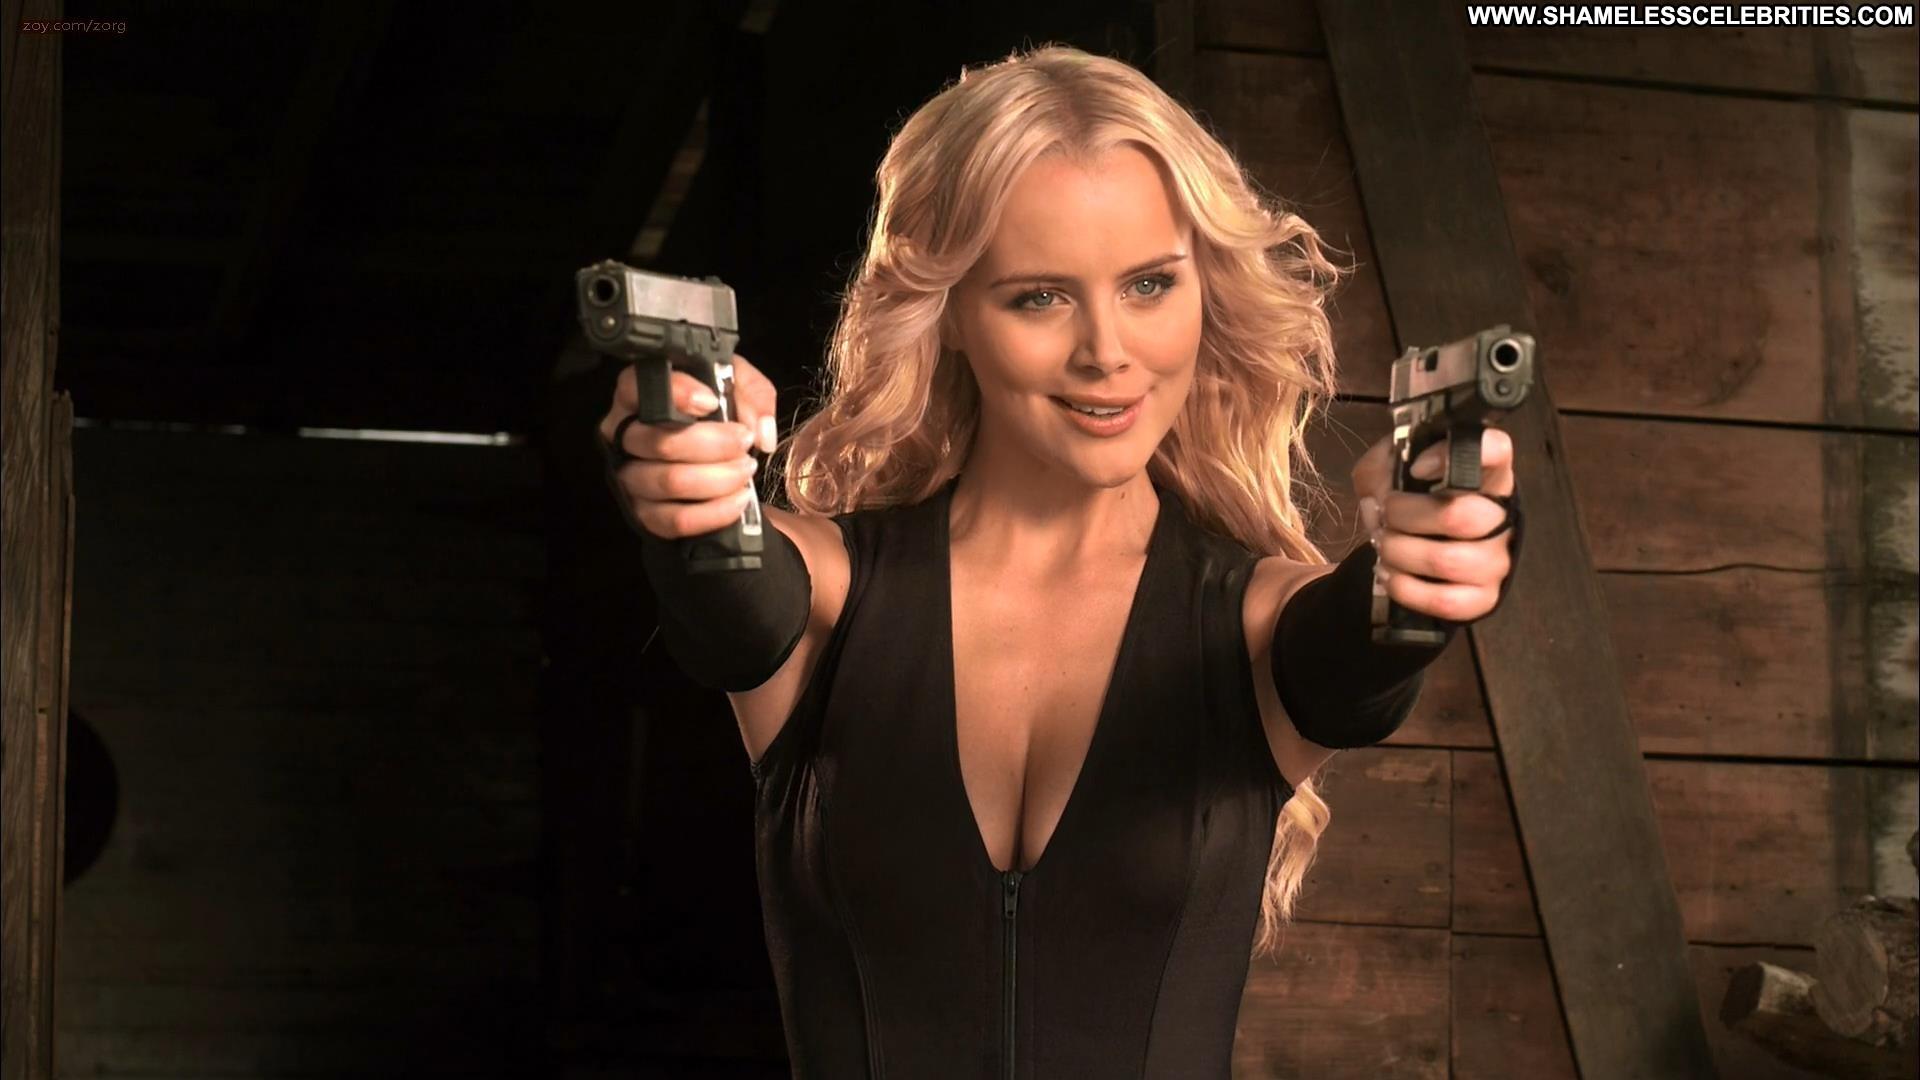 Heather roop guns girls and gambling 2011 2